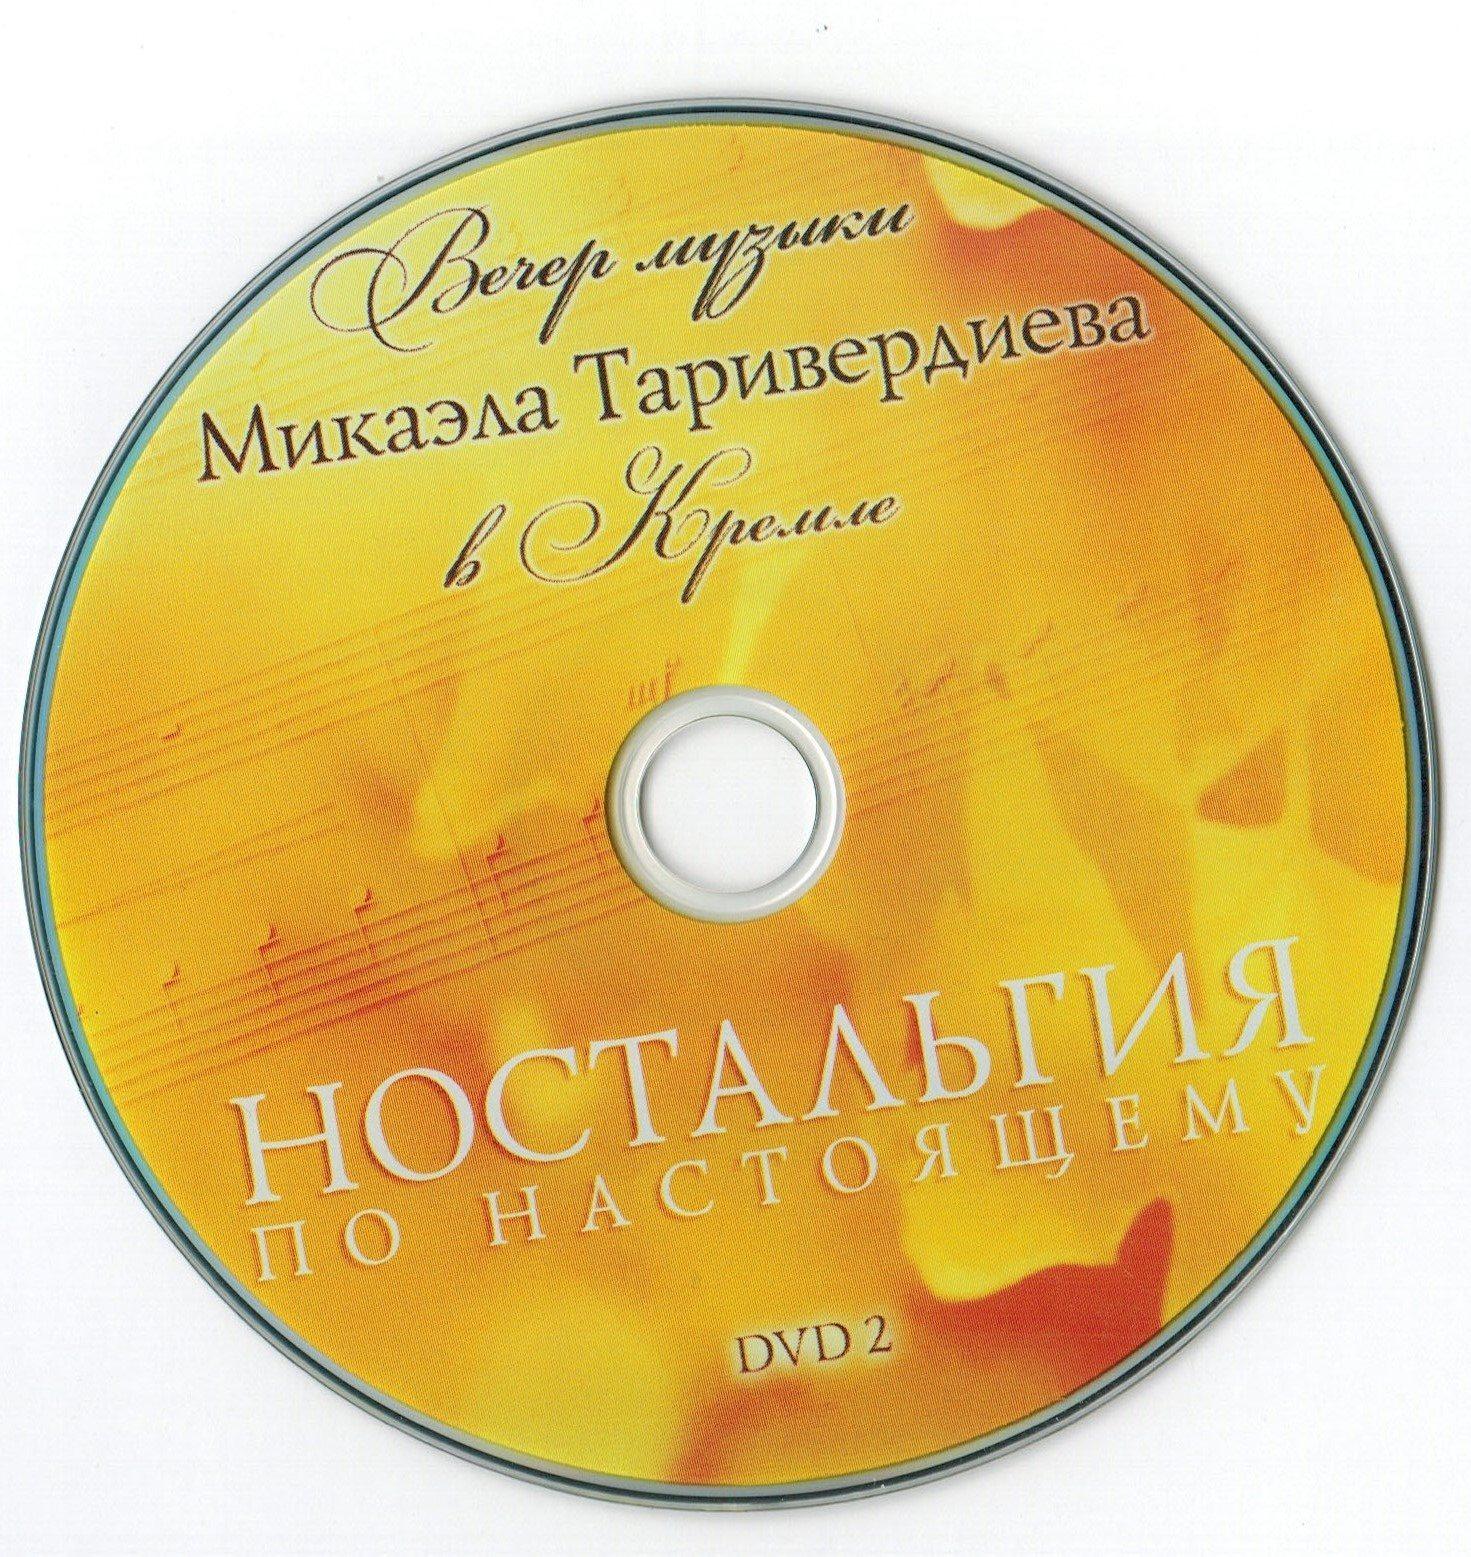 http://i5.imageban.ru/out/2014/07/30/f541076e5d1ebfa793afa4ba08484ced.jpg